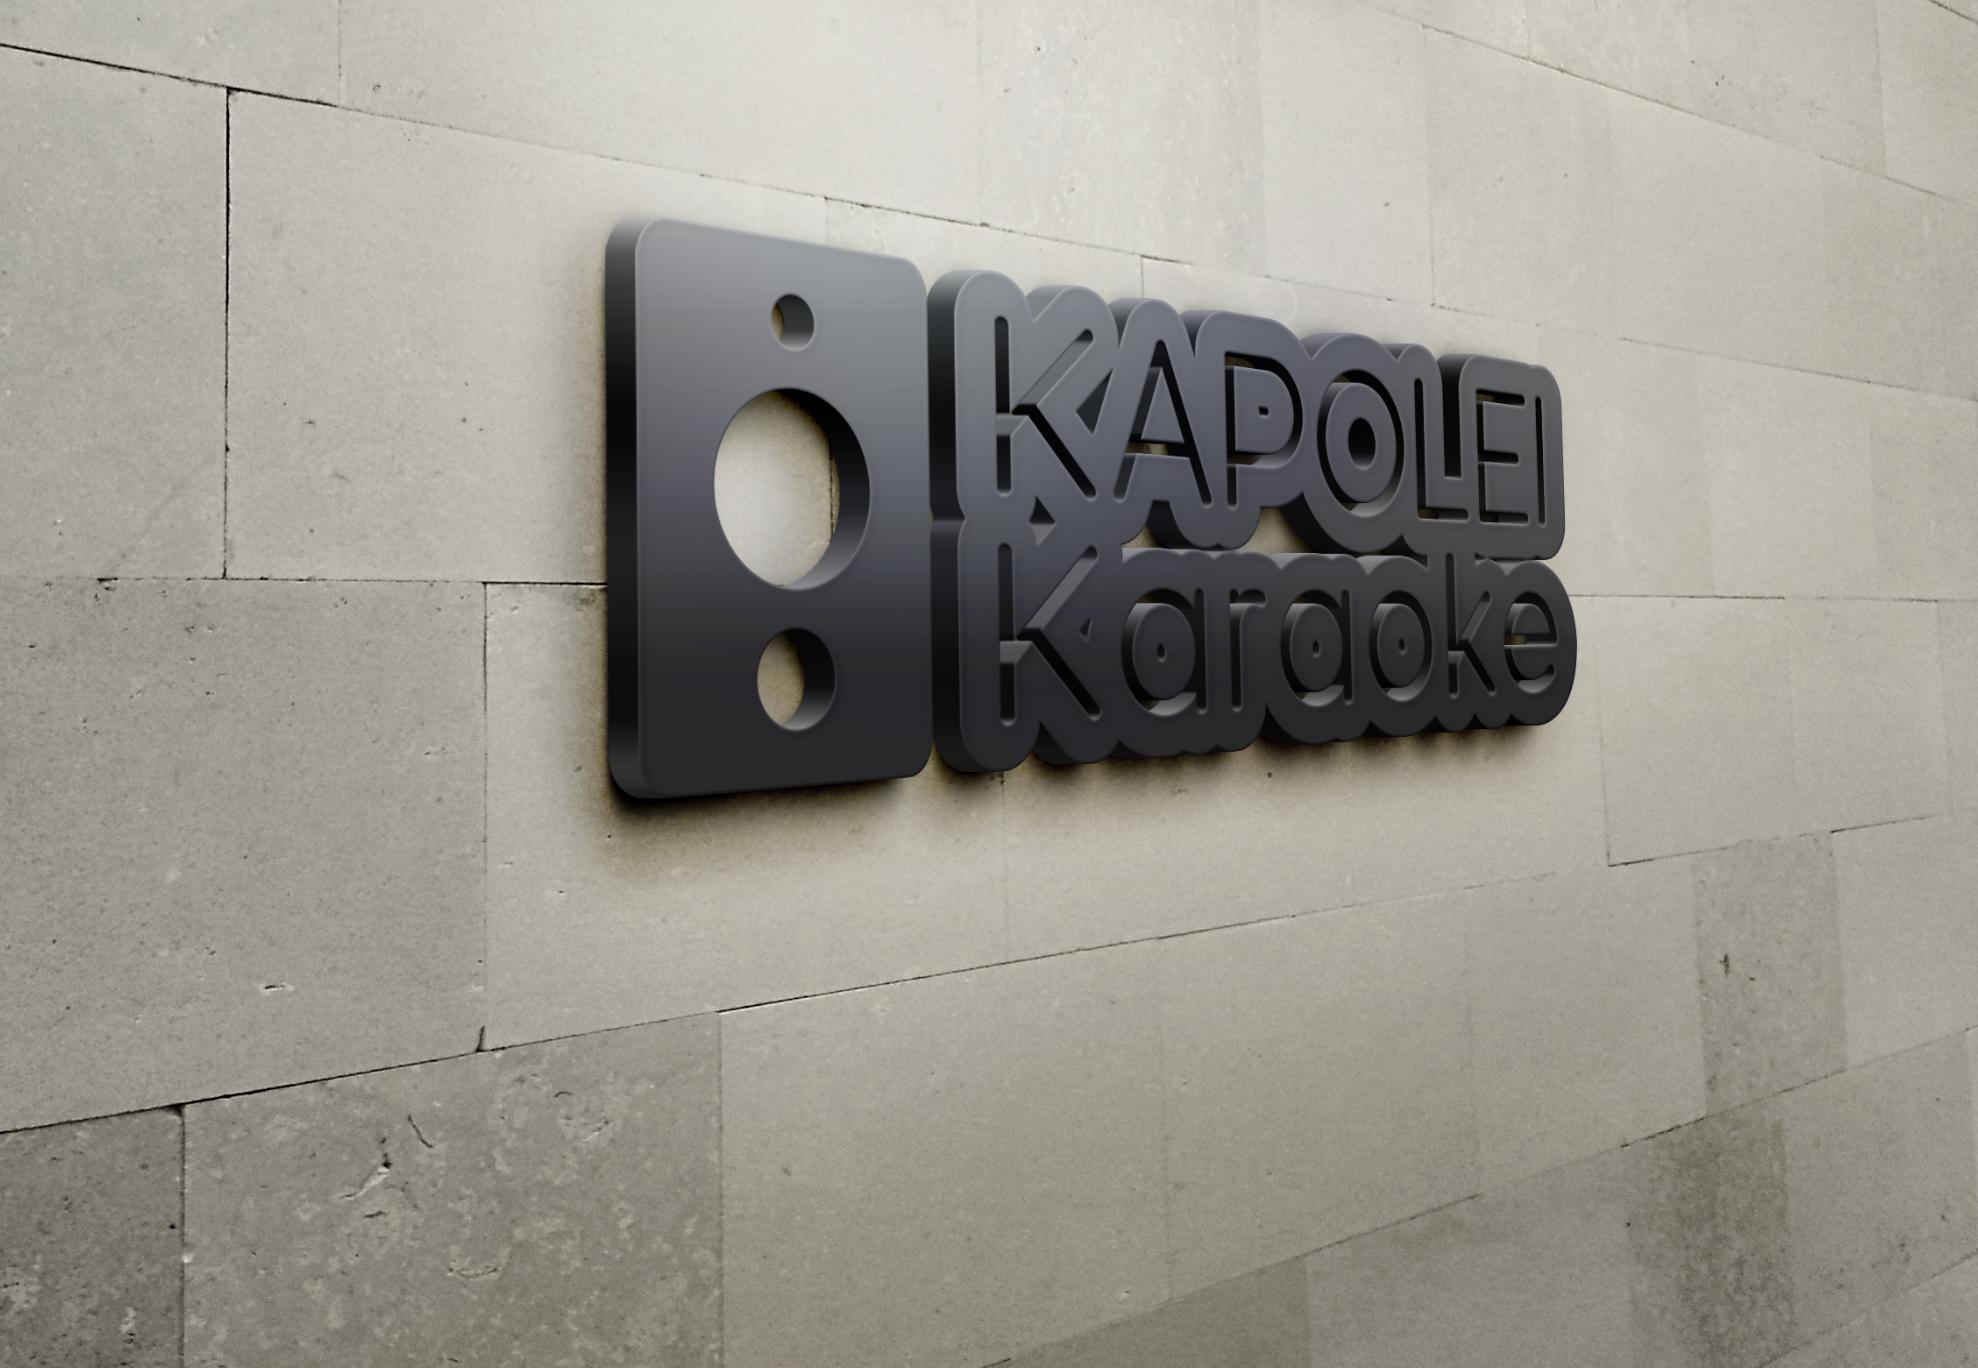 Kapolei Karaoke